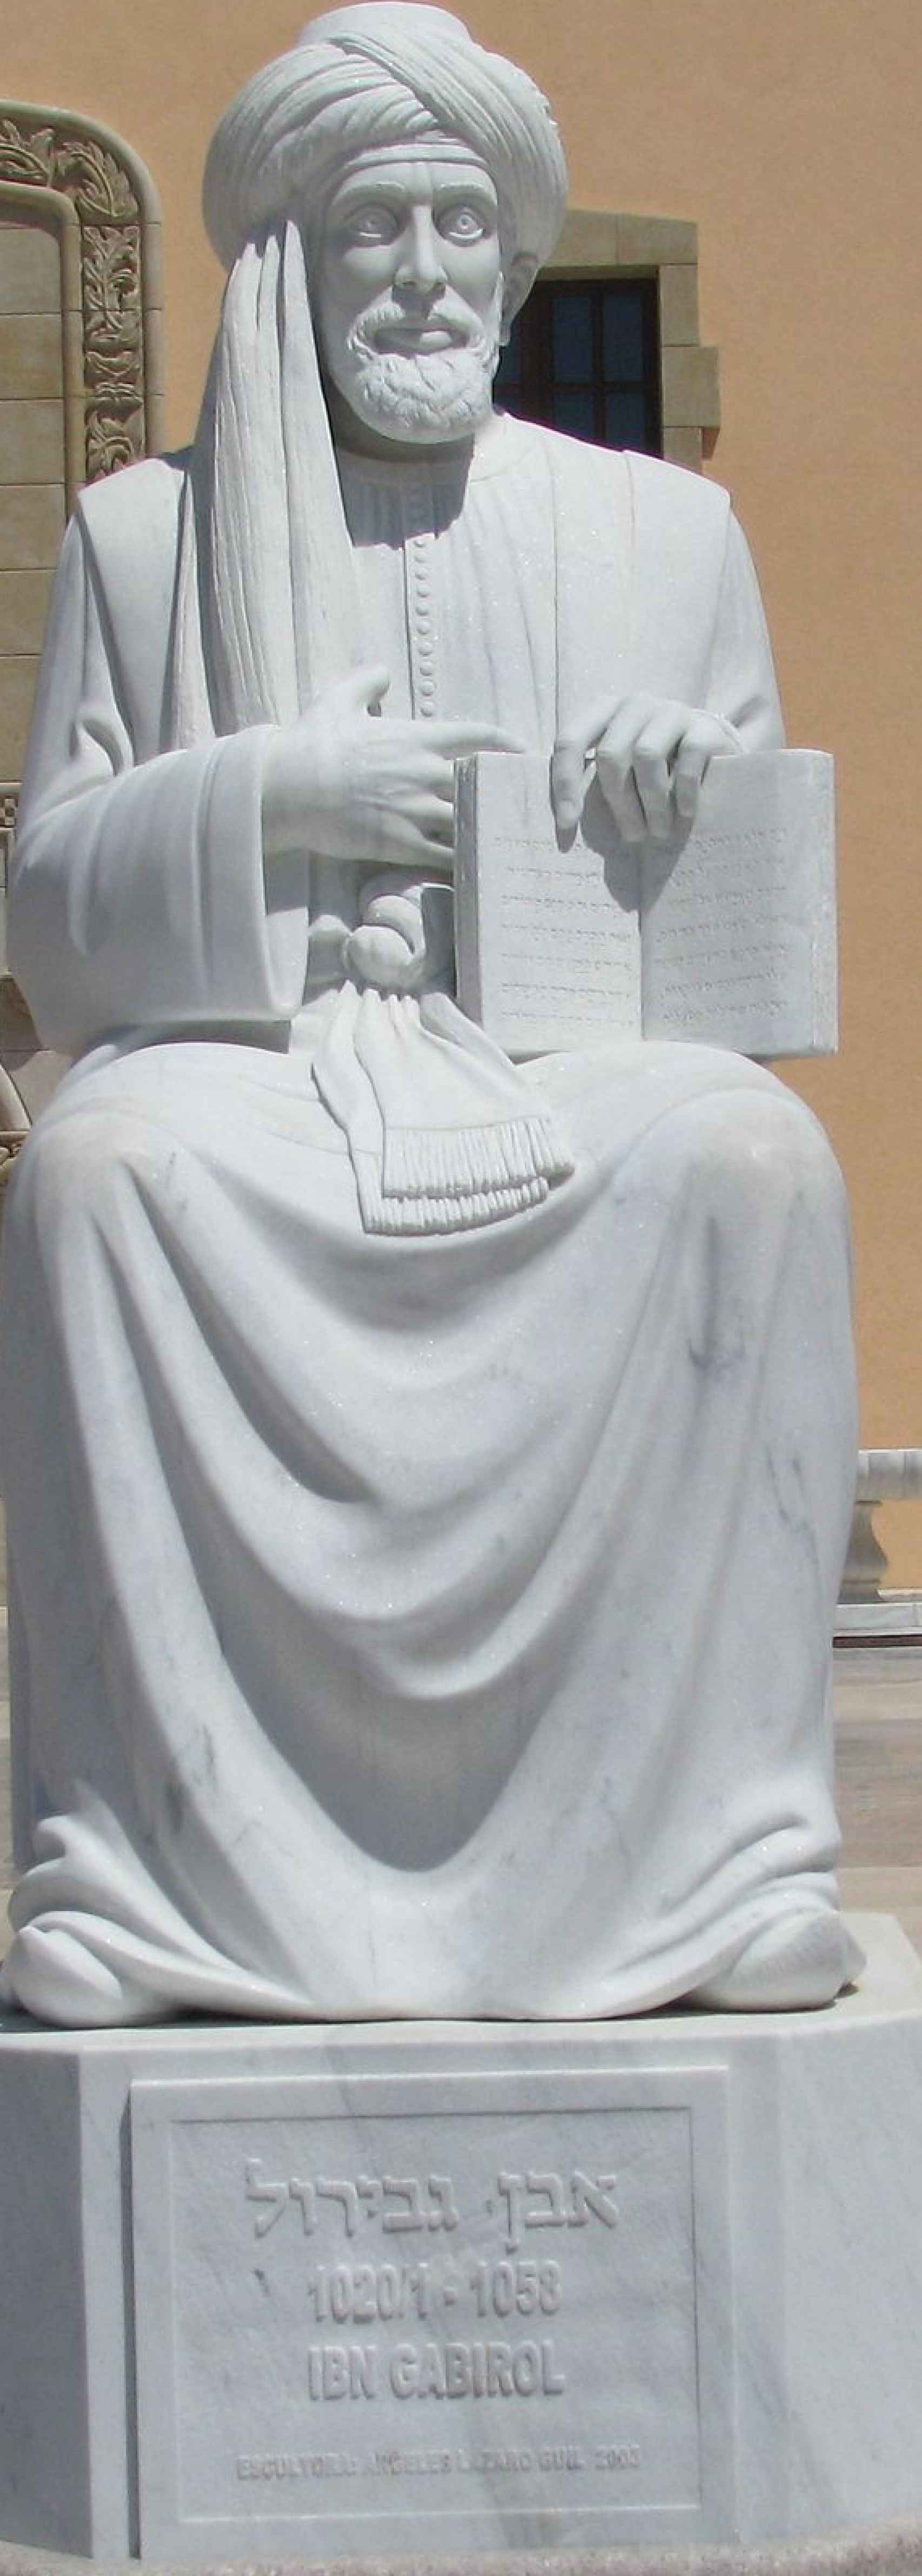 La estatua en Israel.